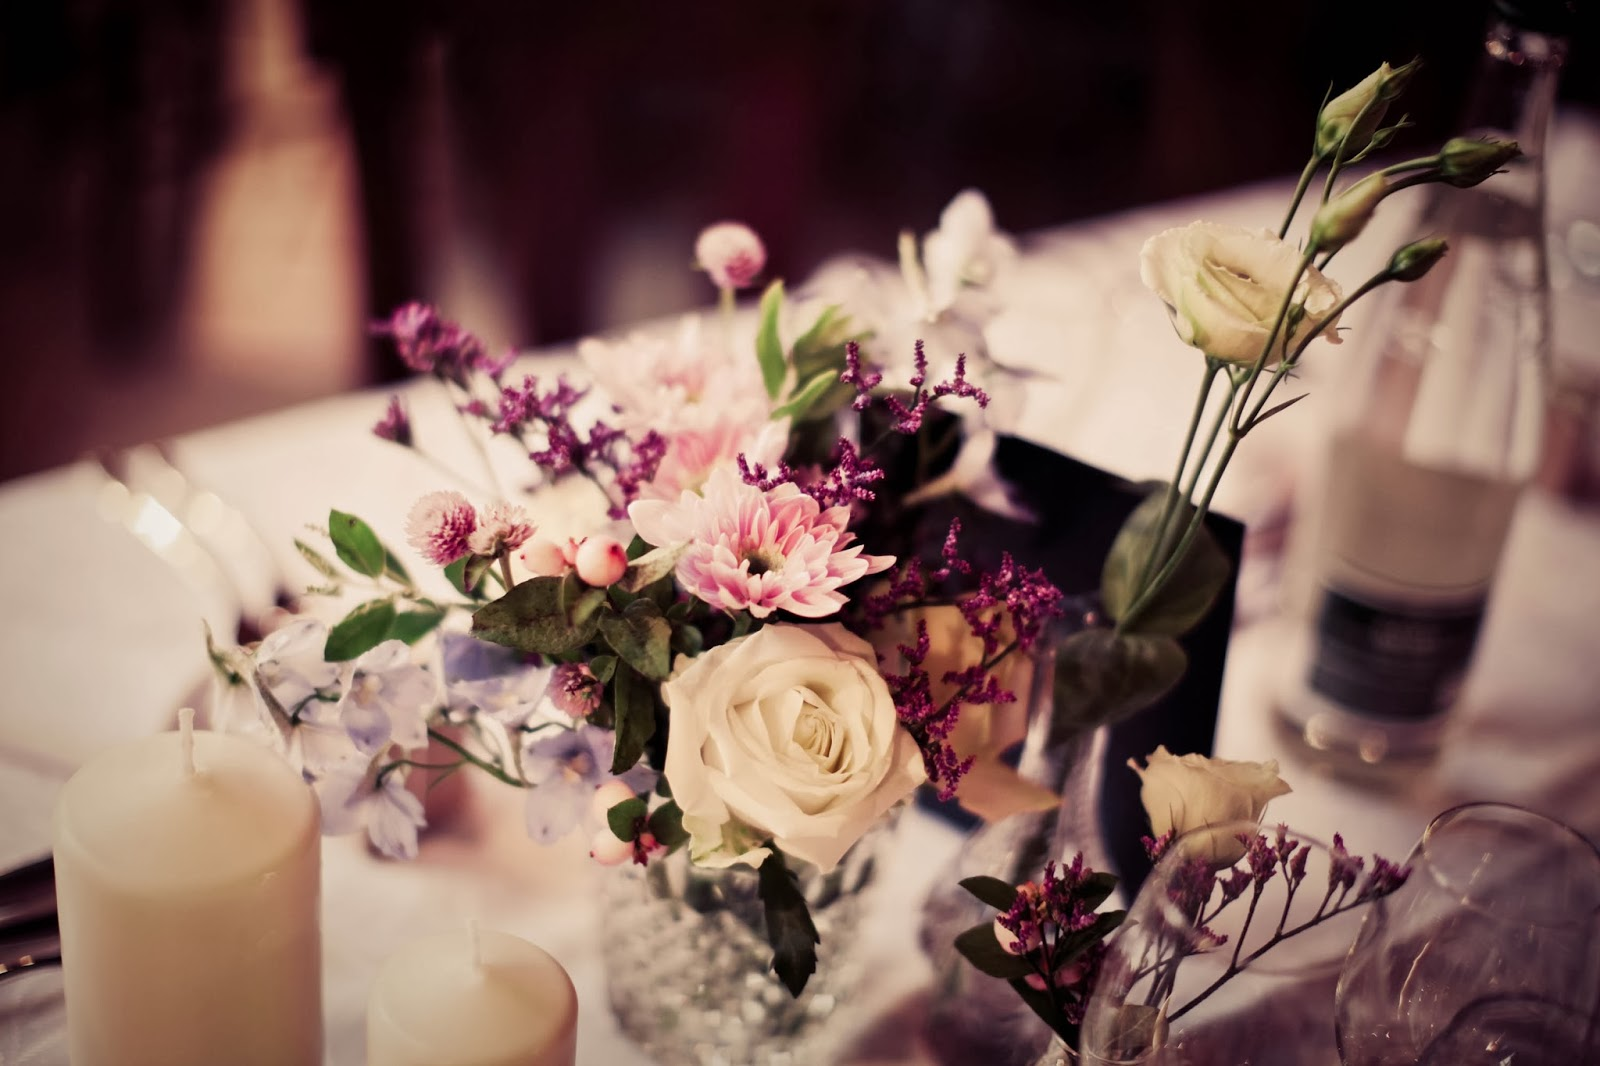 Retro wedding table decoration - wedding photographer : Elisabeth Perotin